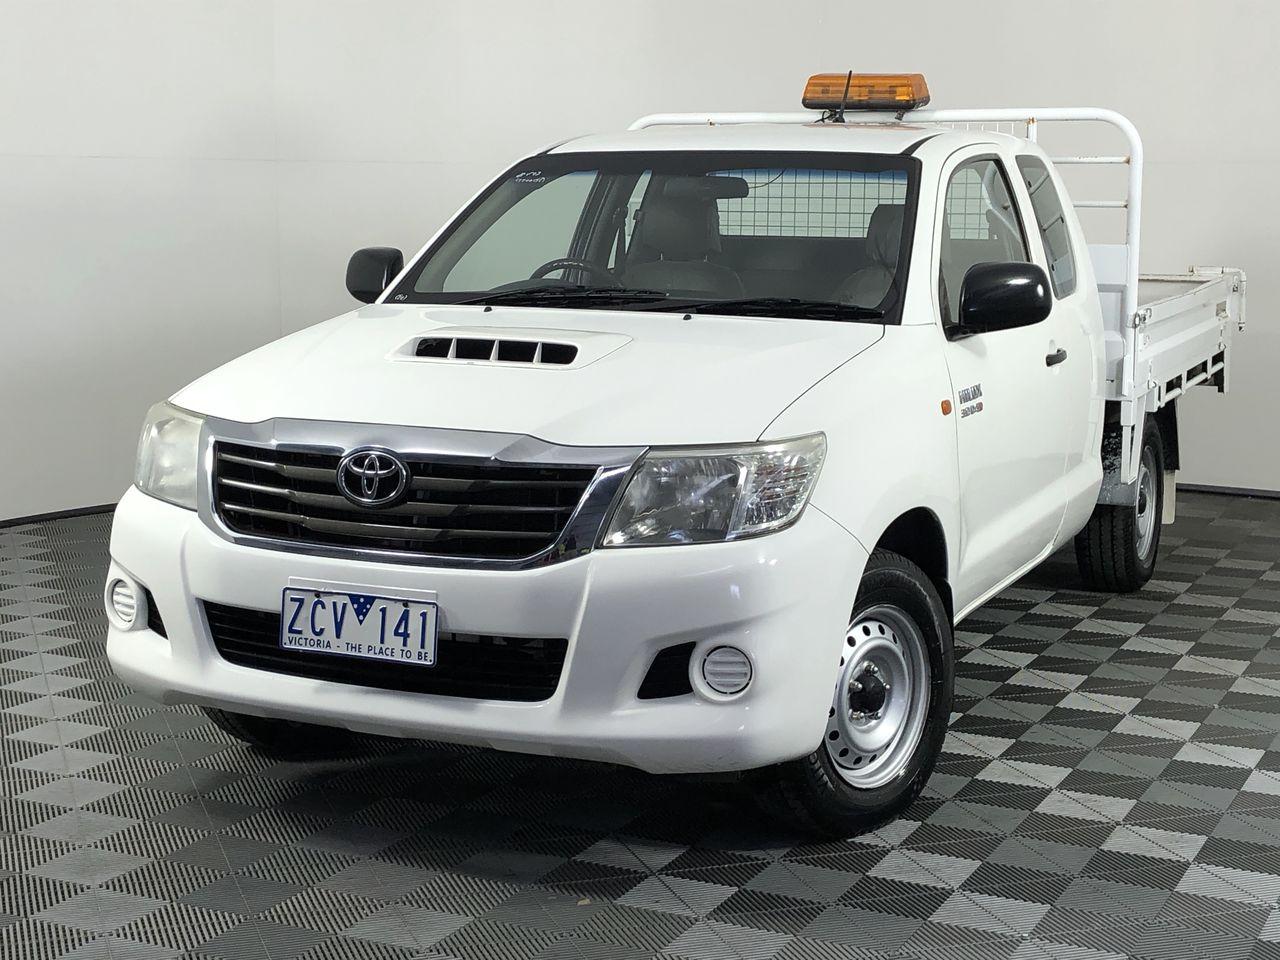 2012 Toyota Hilux 4X2 SR KUN16R Turbo Diesel Manual Ute (EX GOV)